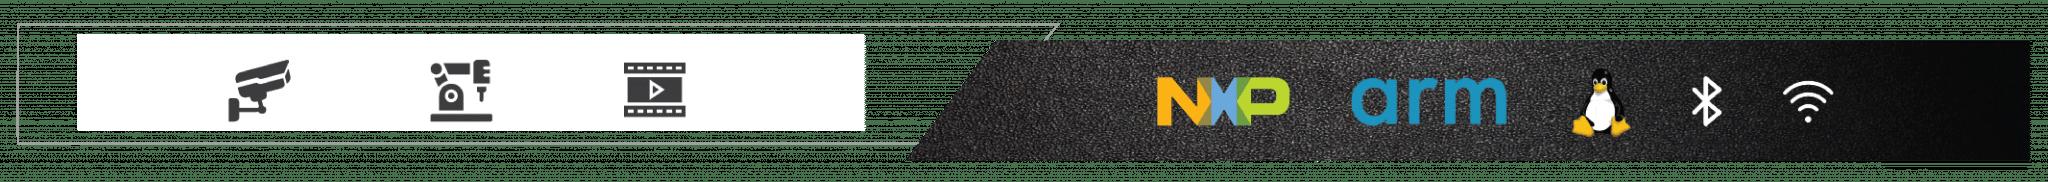 nxp netwoking logo bar no AI 01